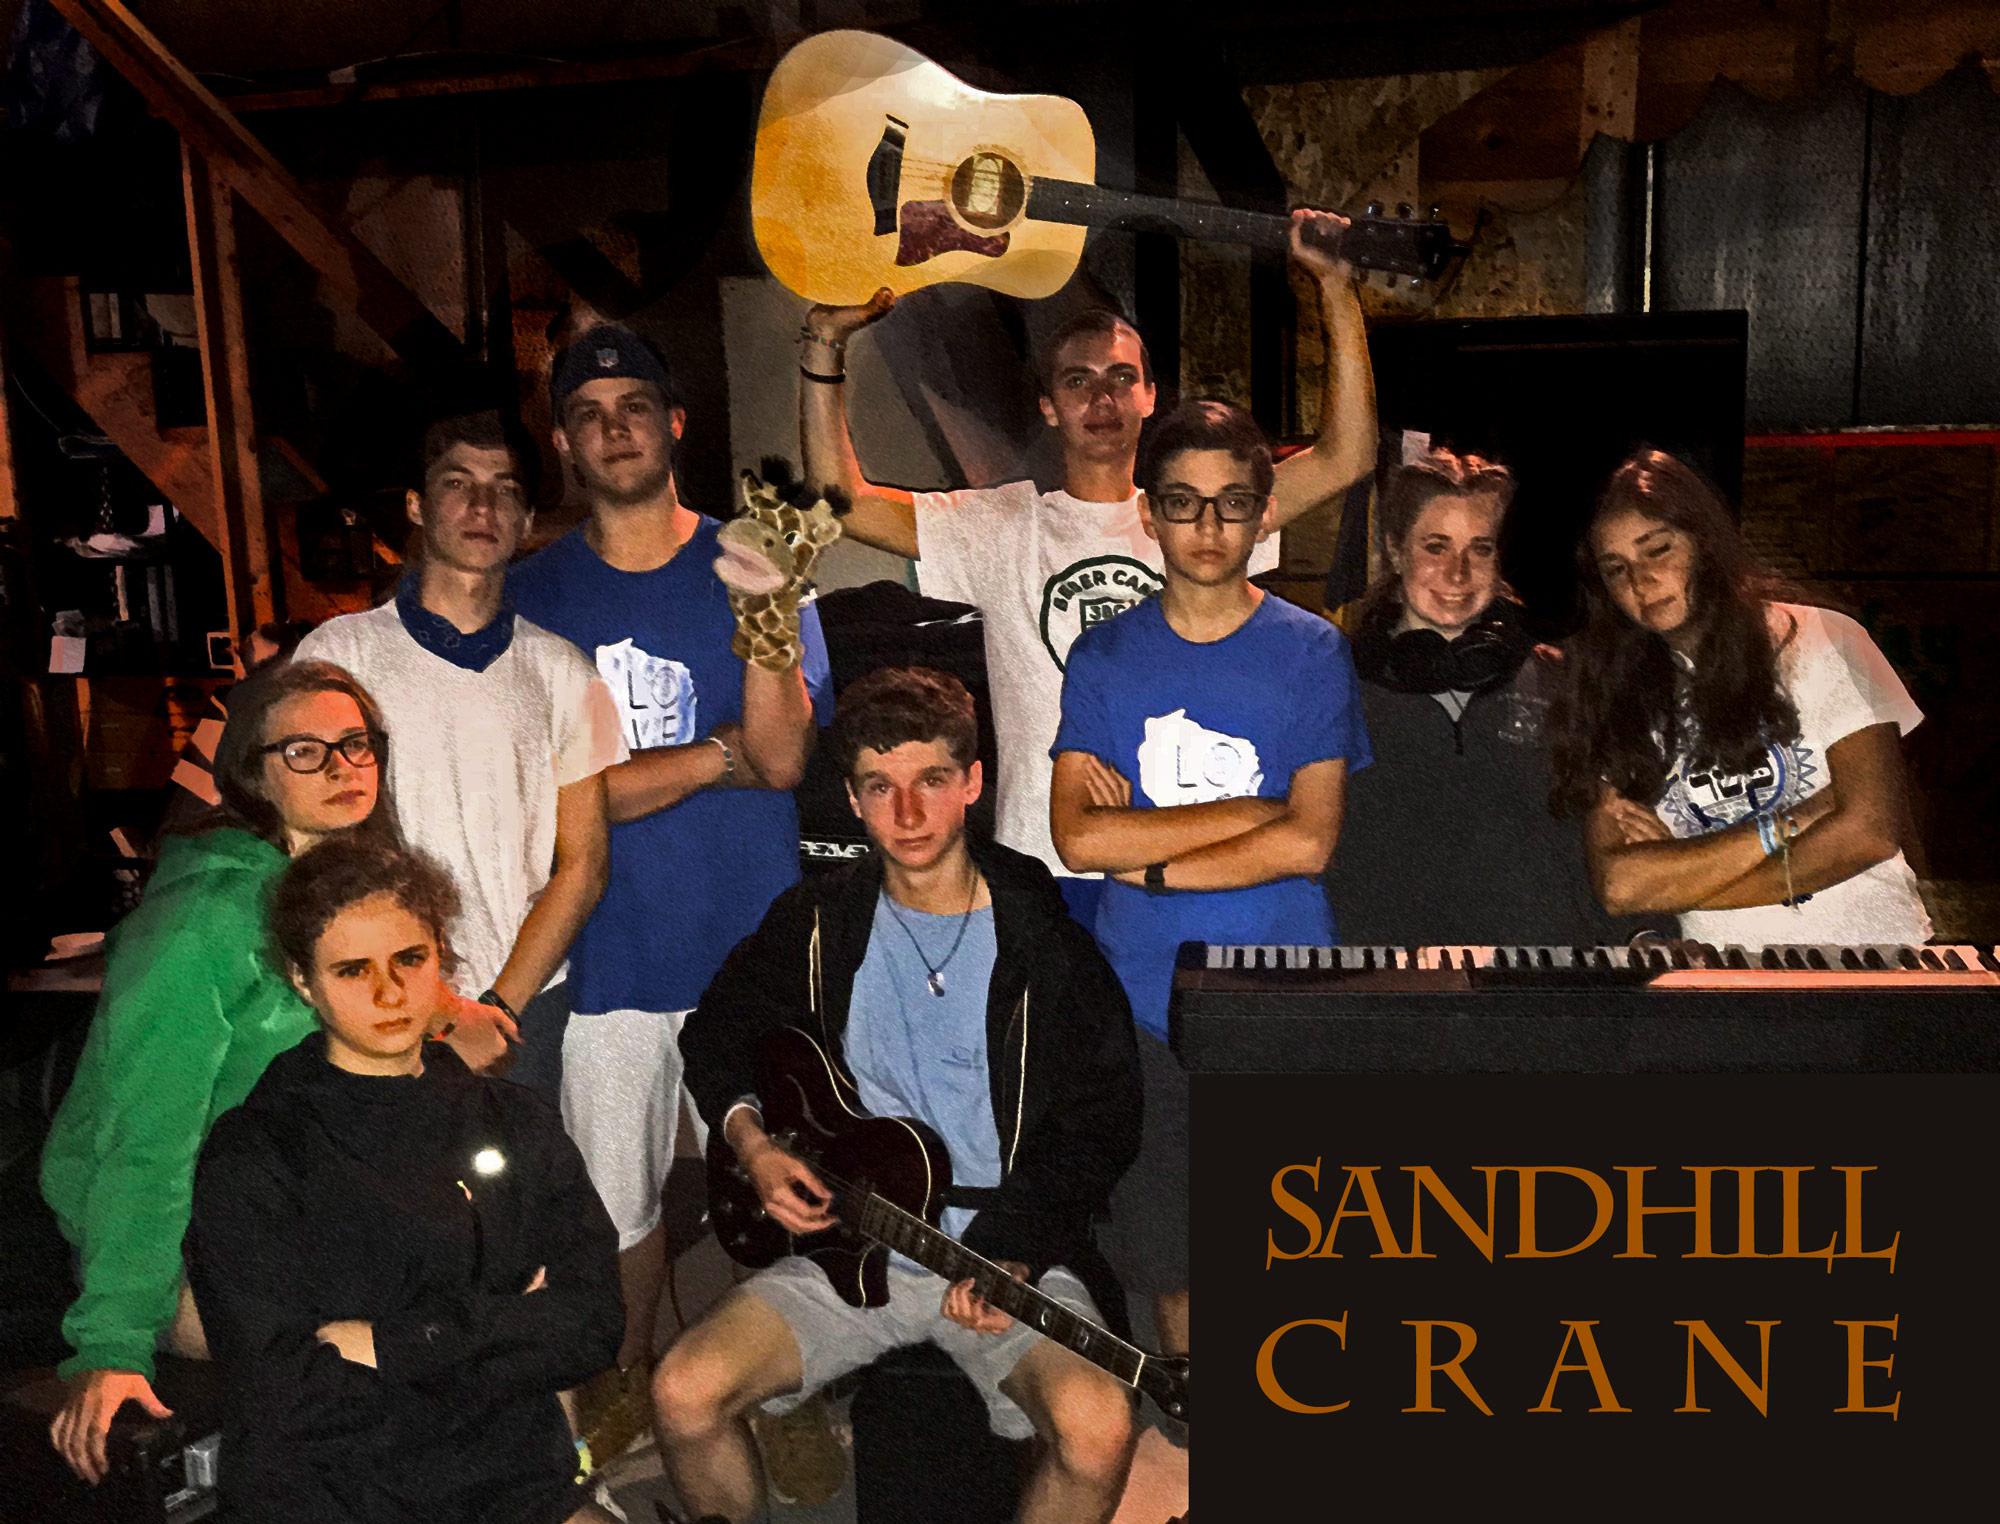 Sandhill-Crane-1.jpg